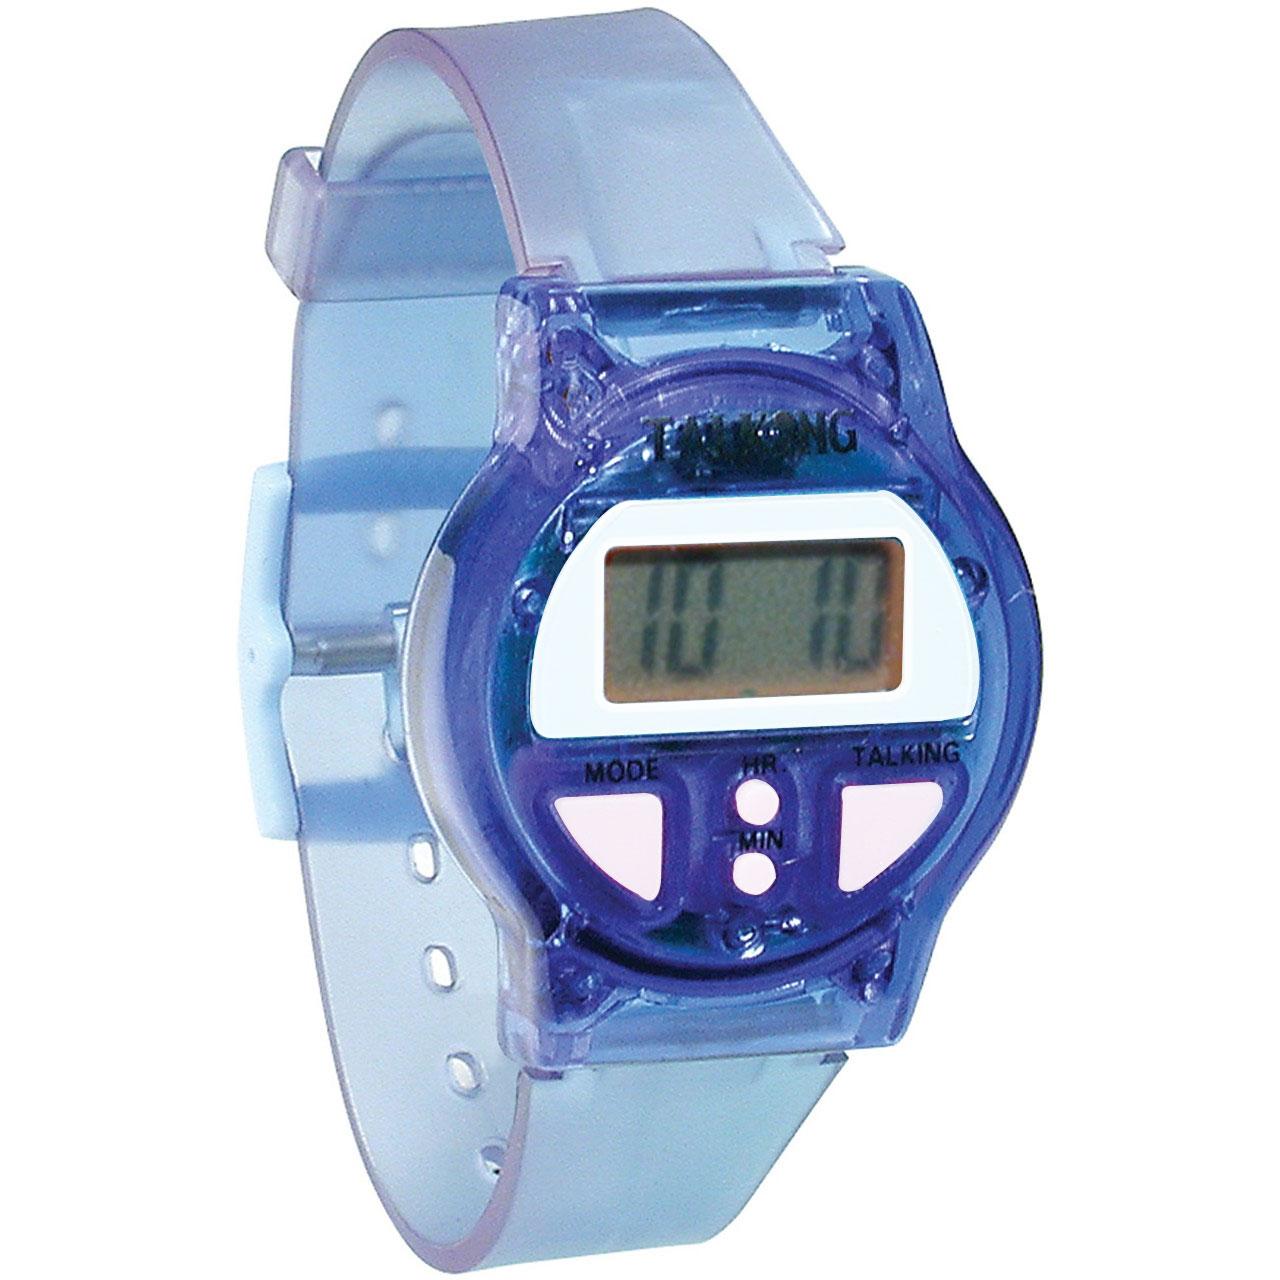 Color Talking Watch -Blue